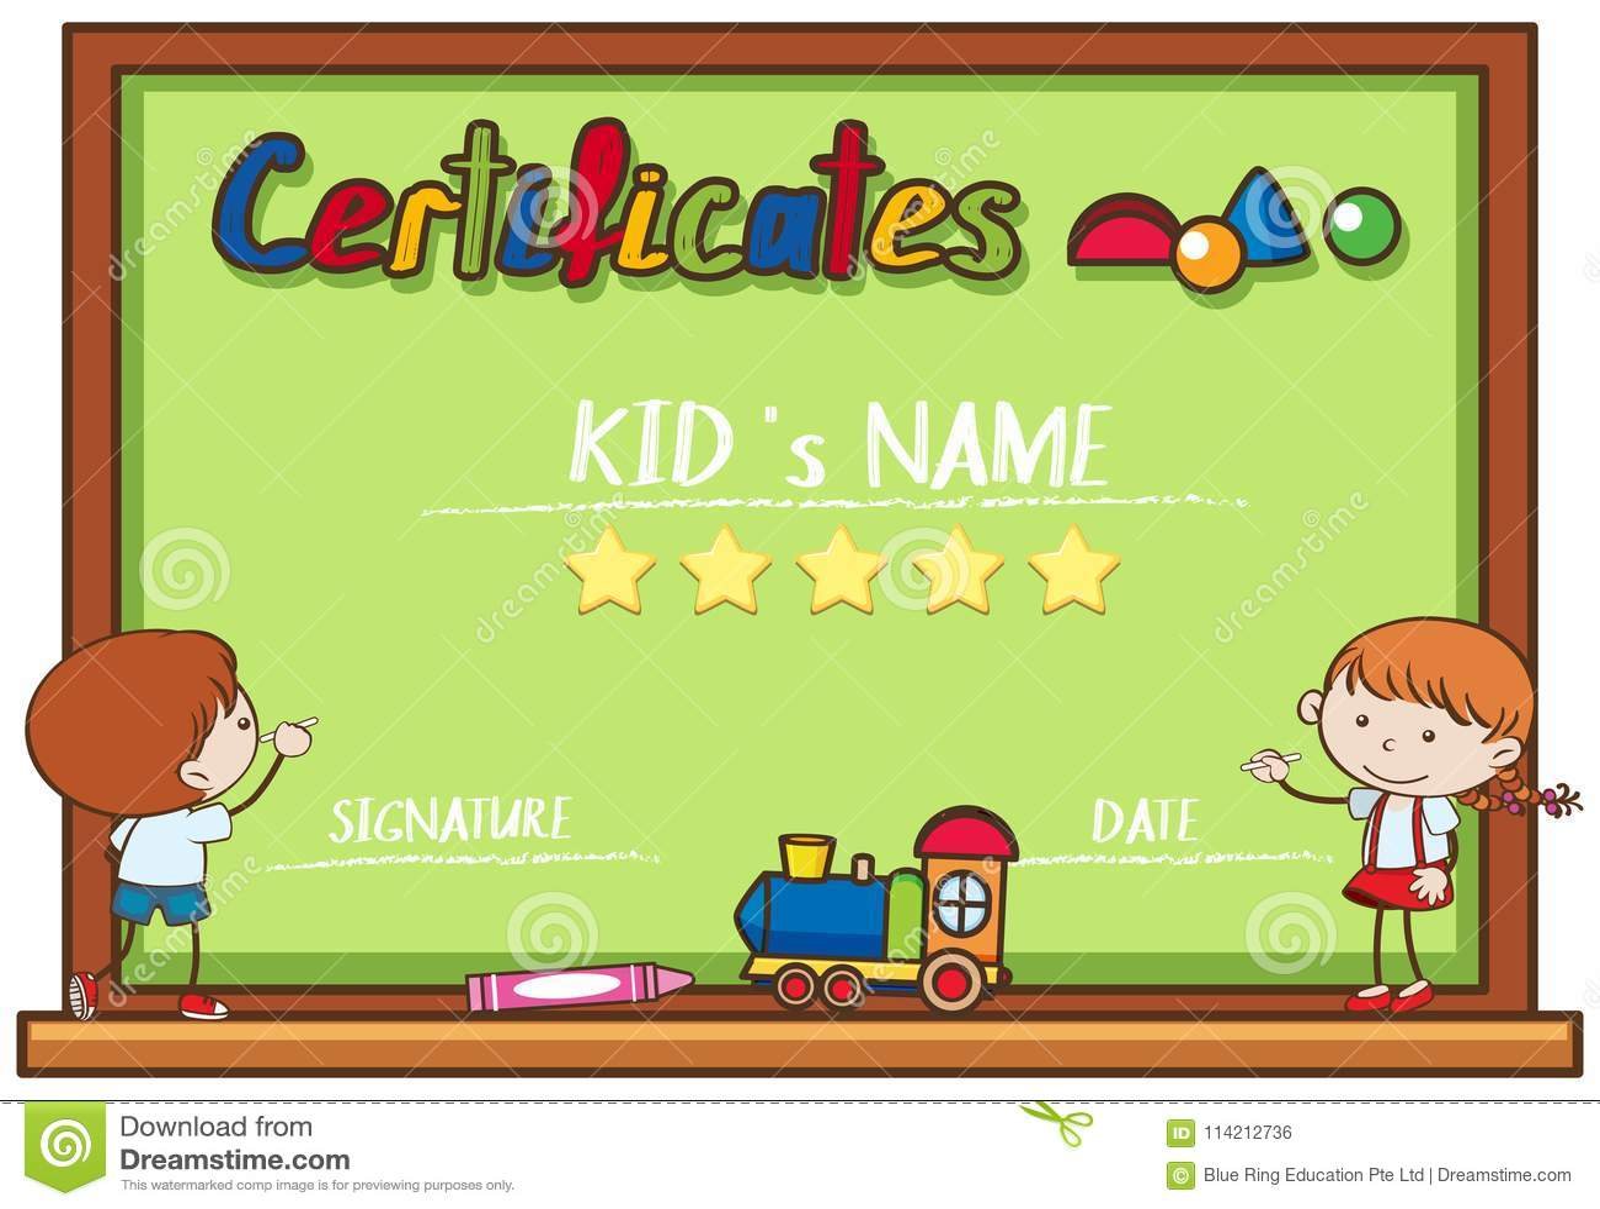 Name Template For Kids Towerdlugopisyreklamowe